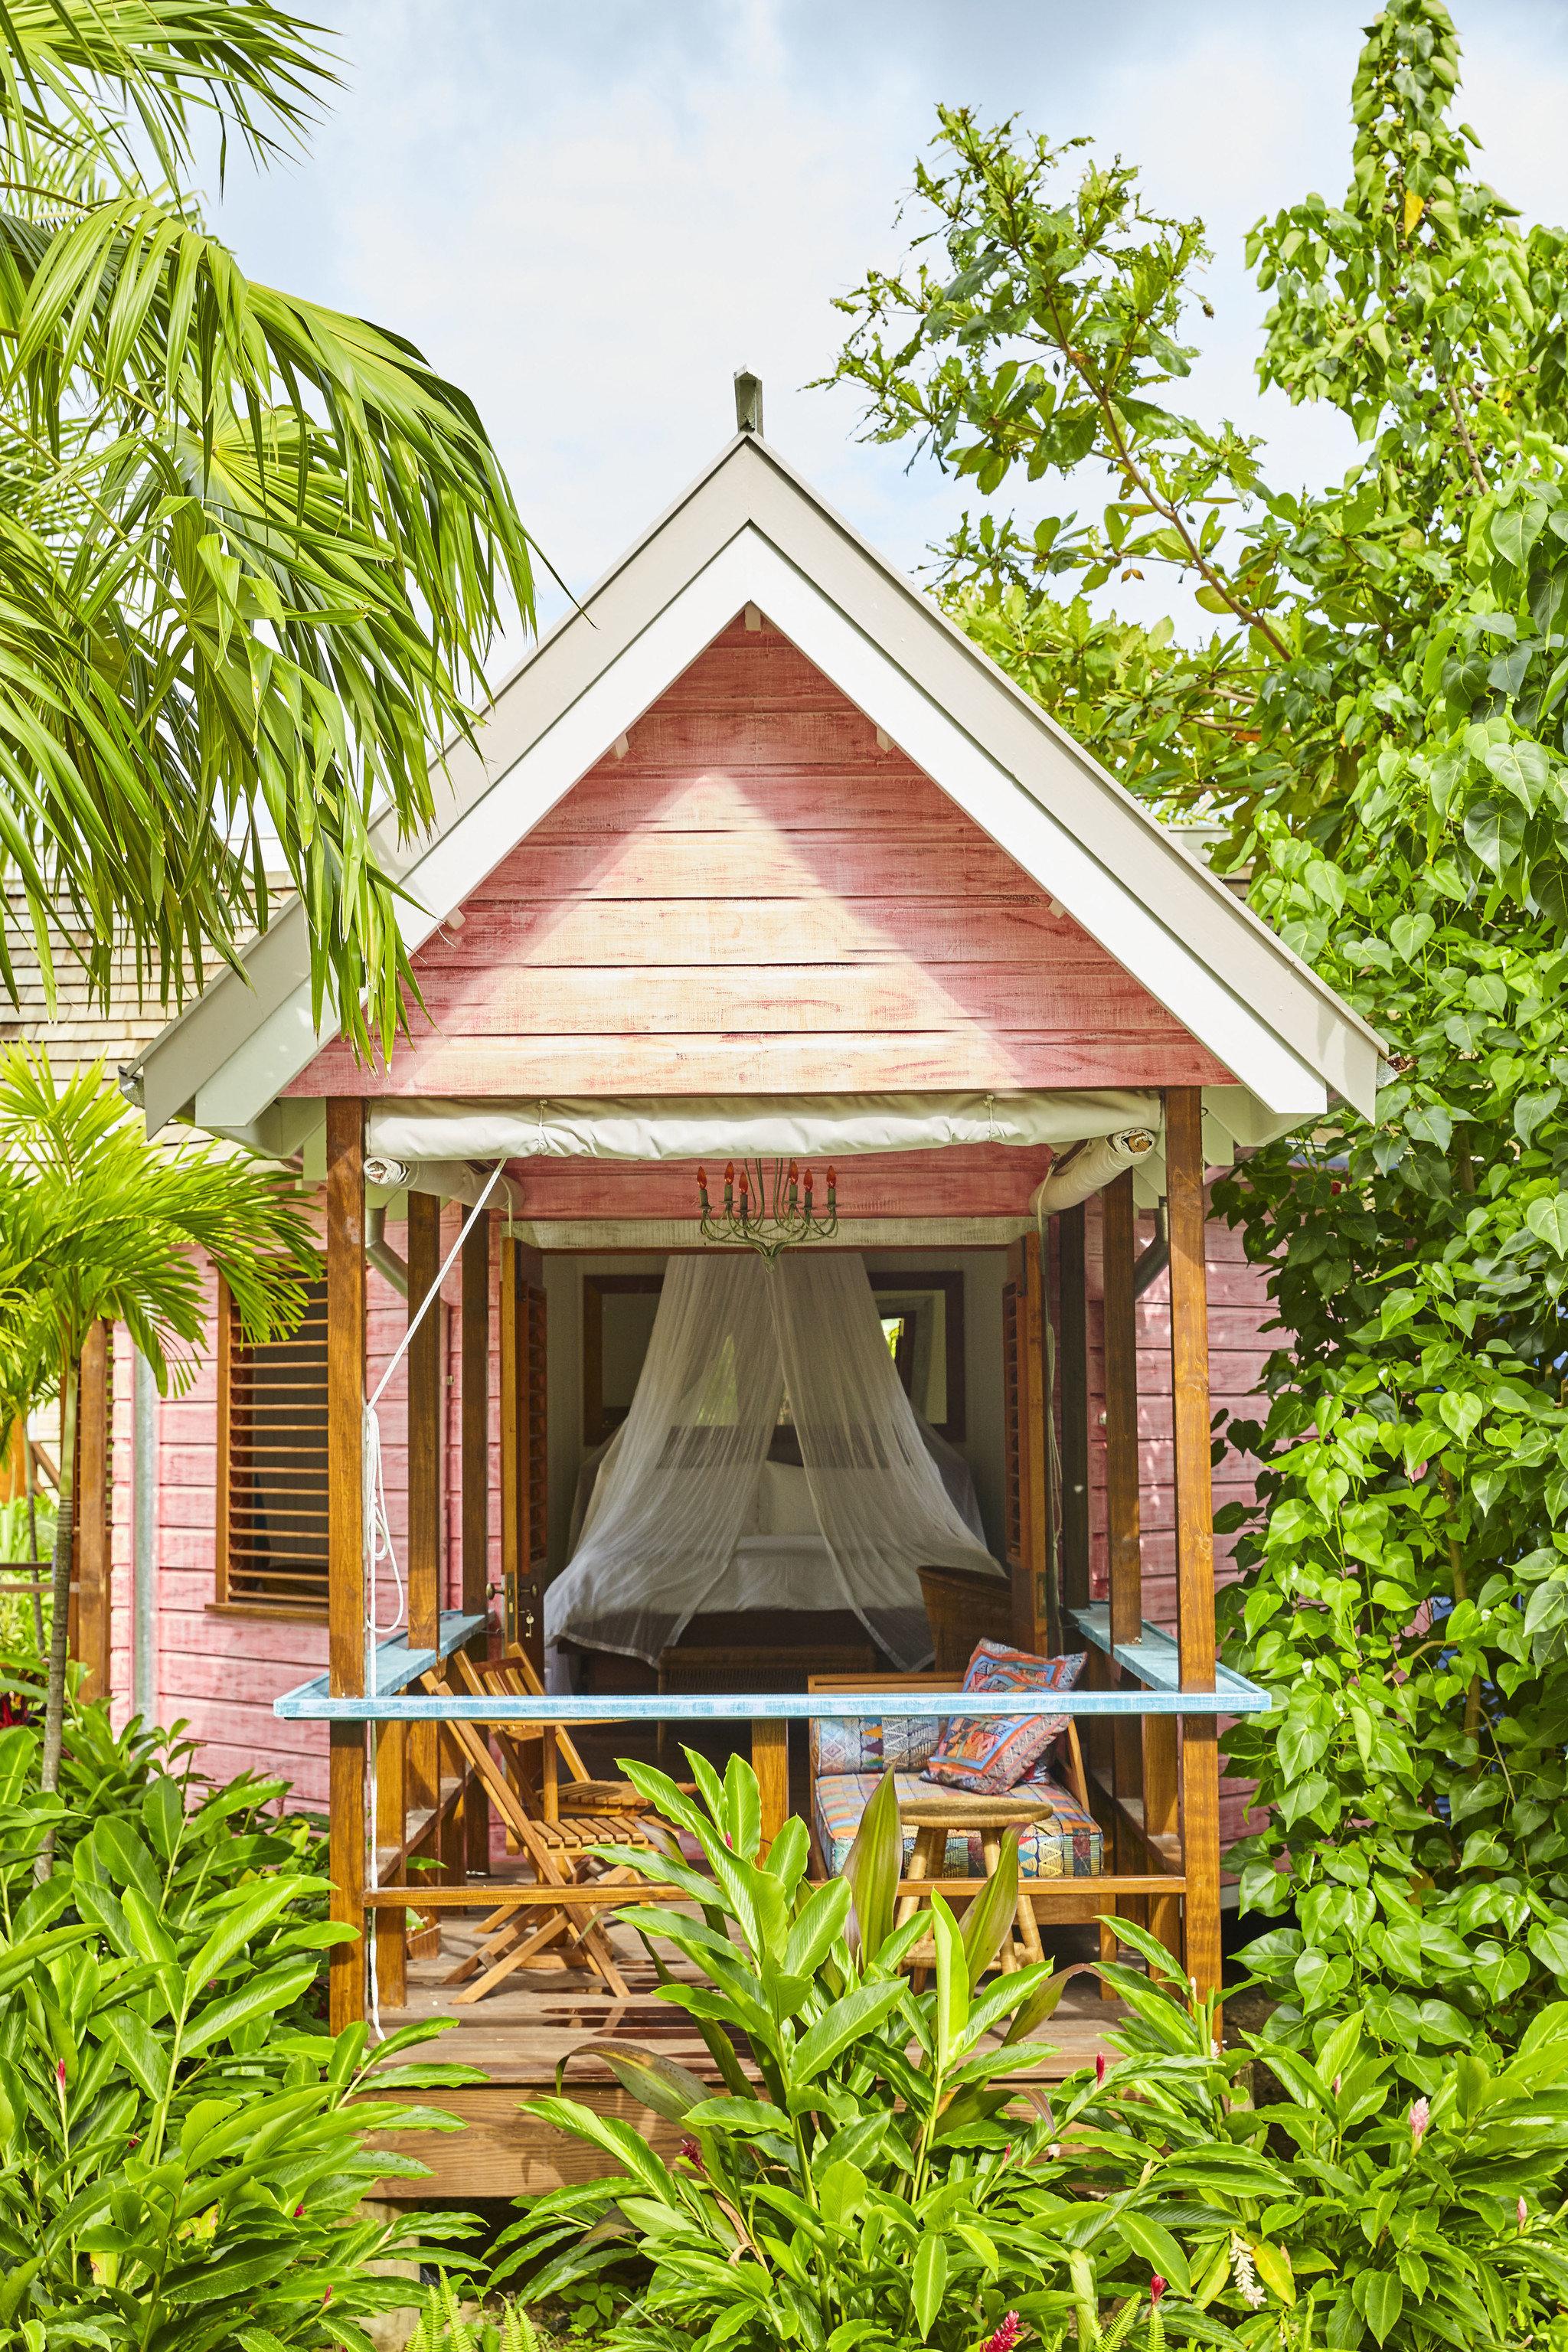 tree building cottage house home outdoor structure shed gazebo plant pavilion backyard hut